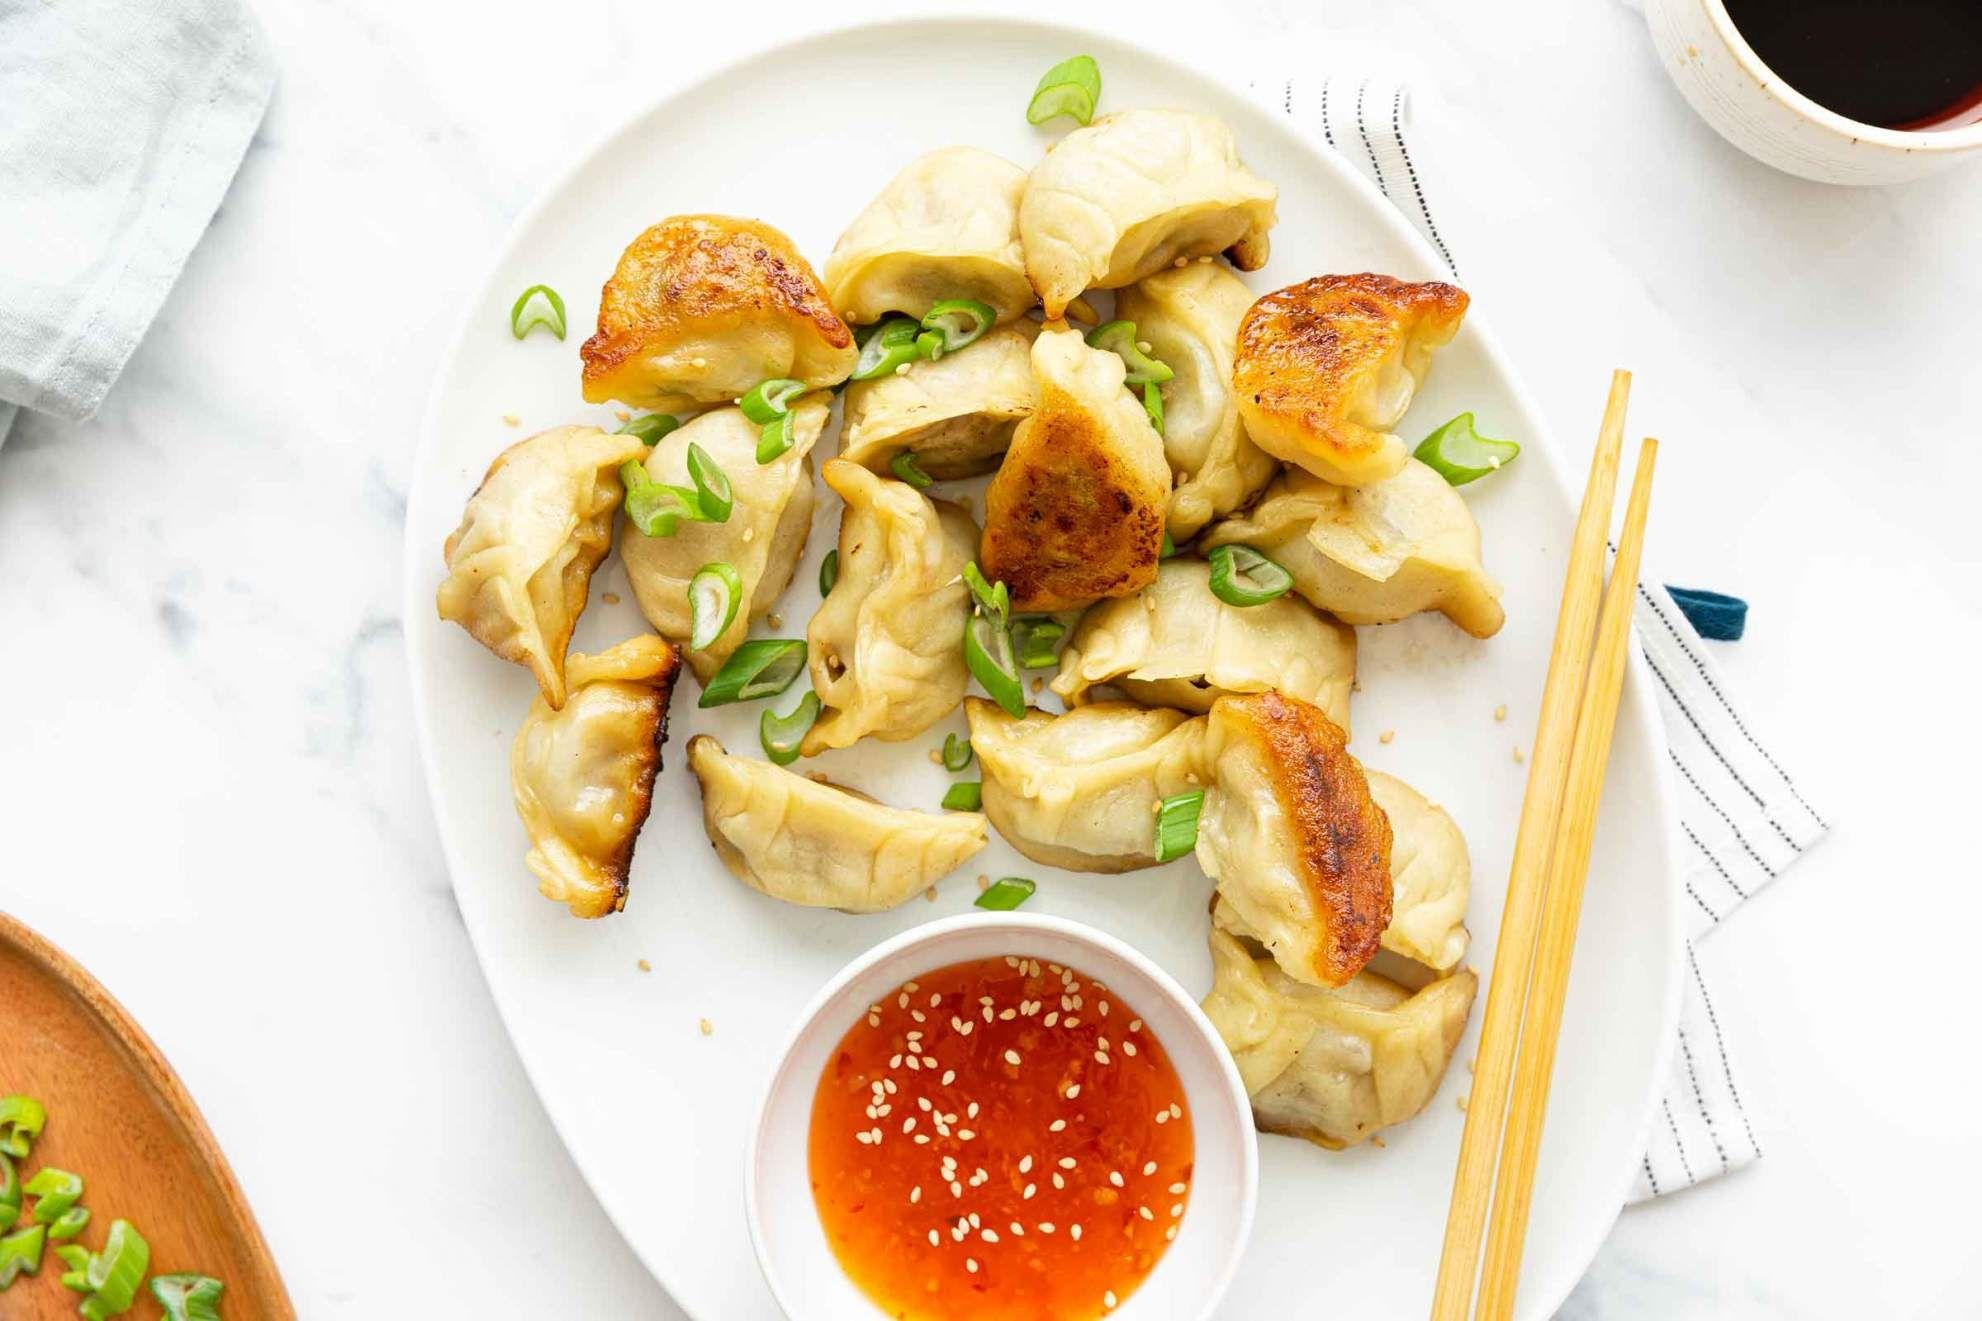 Gyoza Dumplings with Ground Turkey